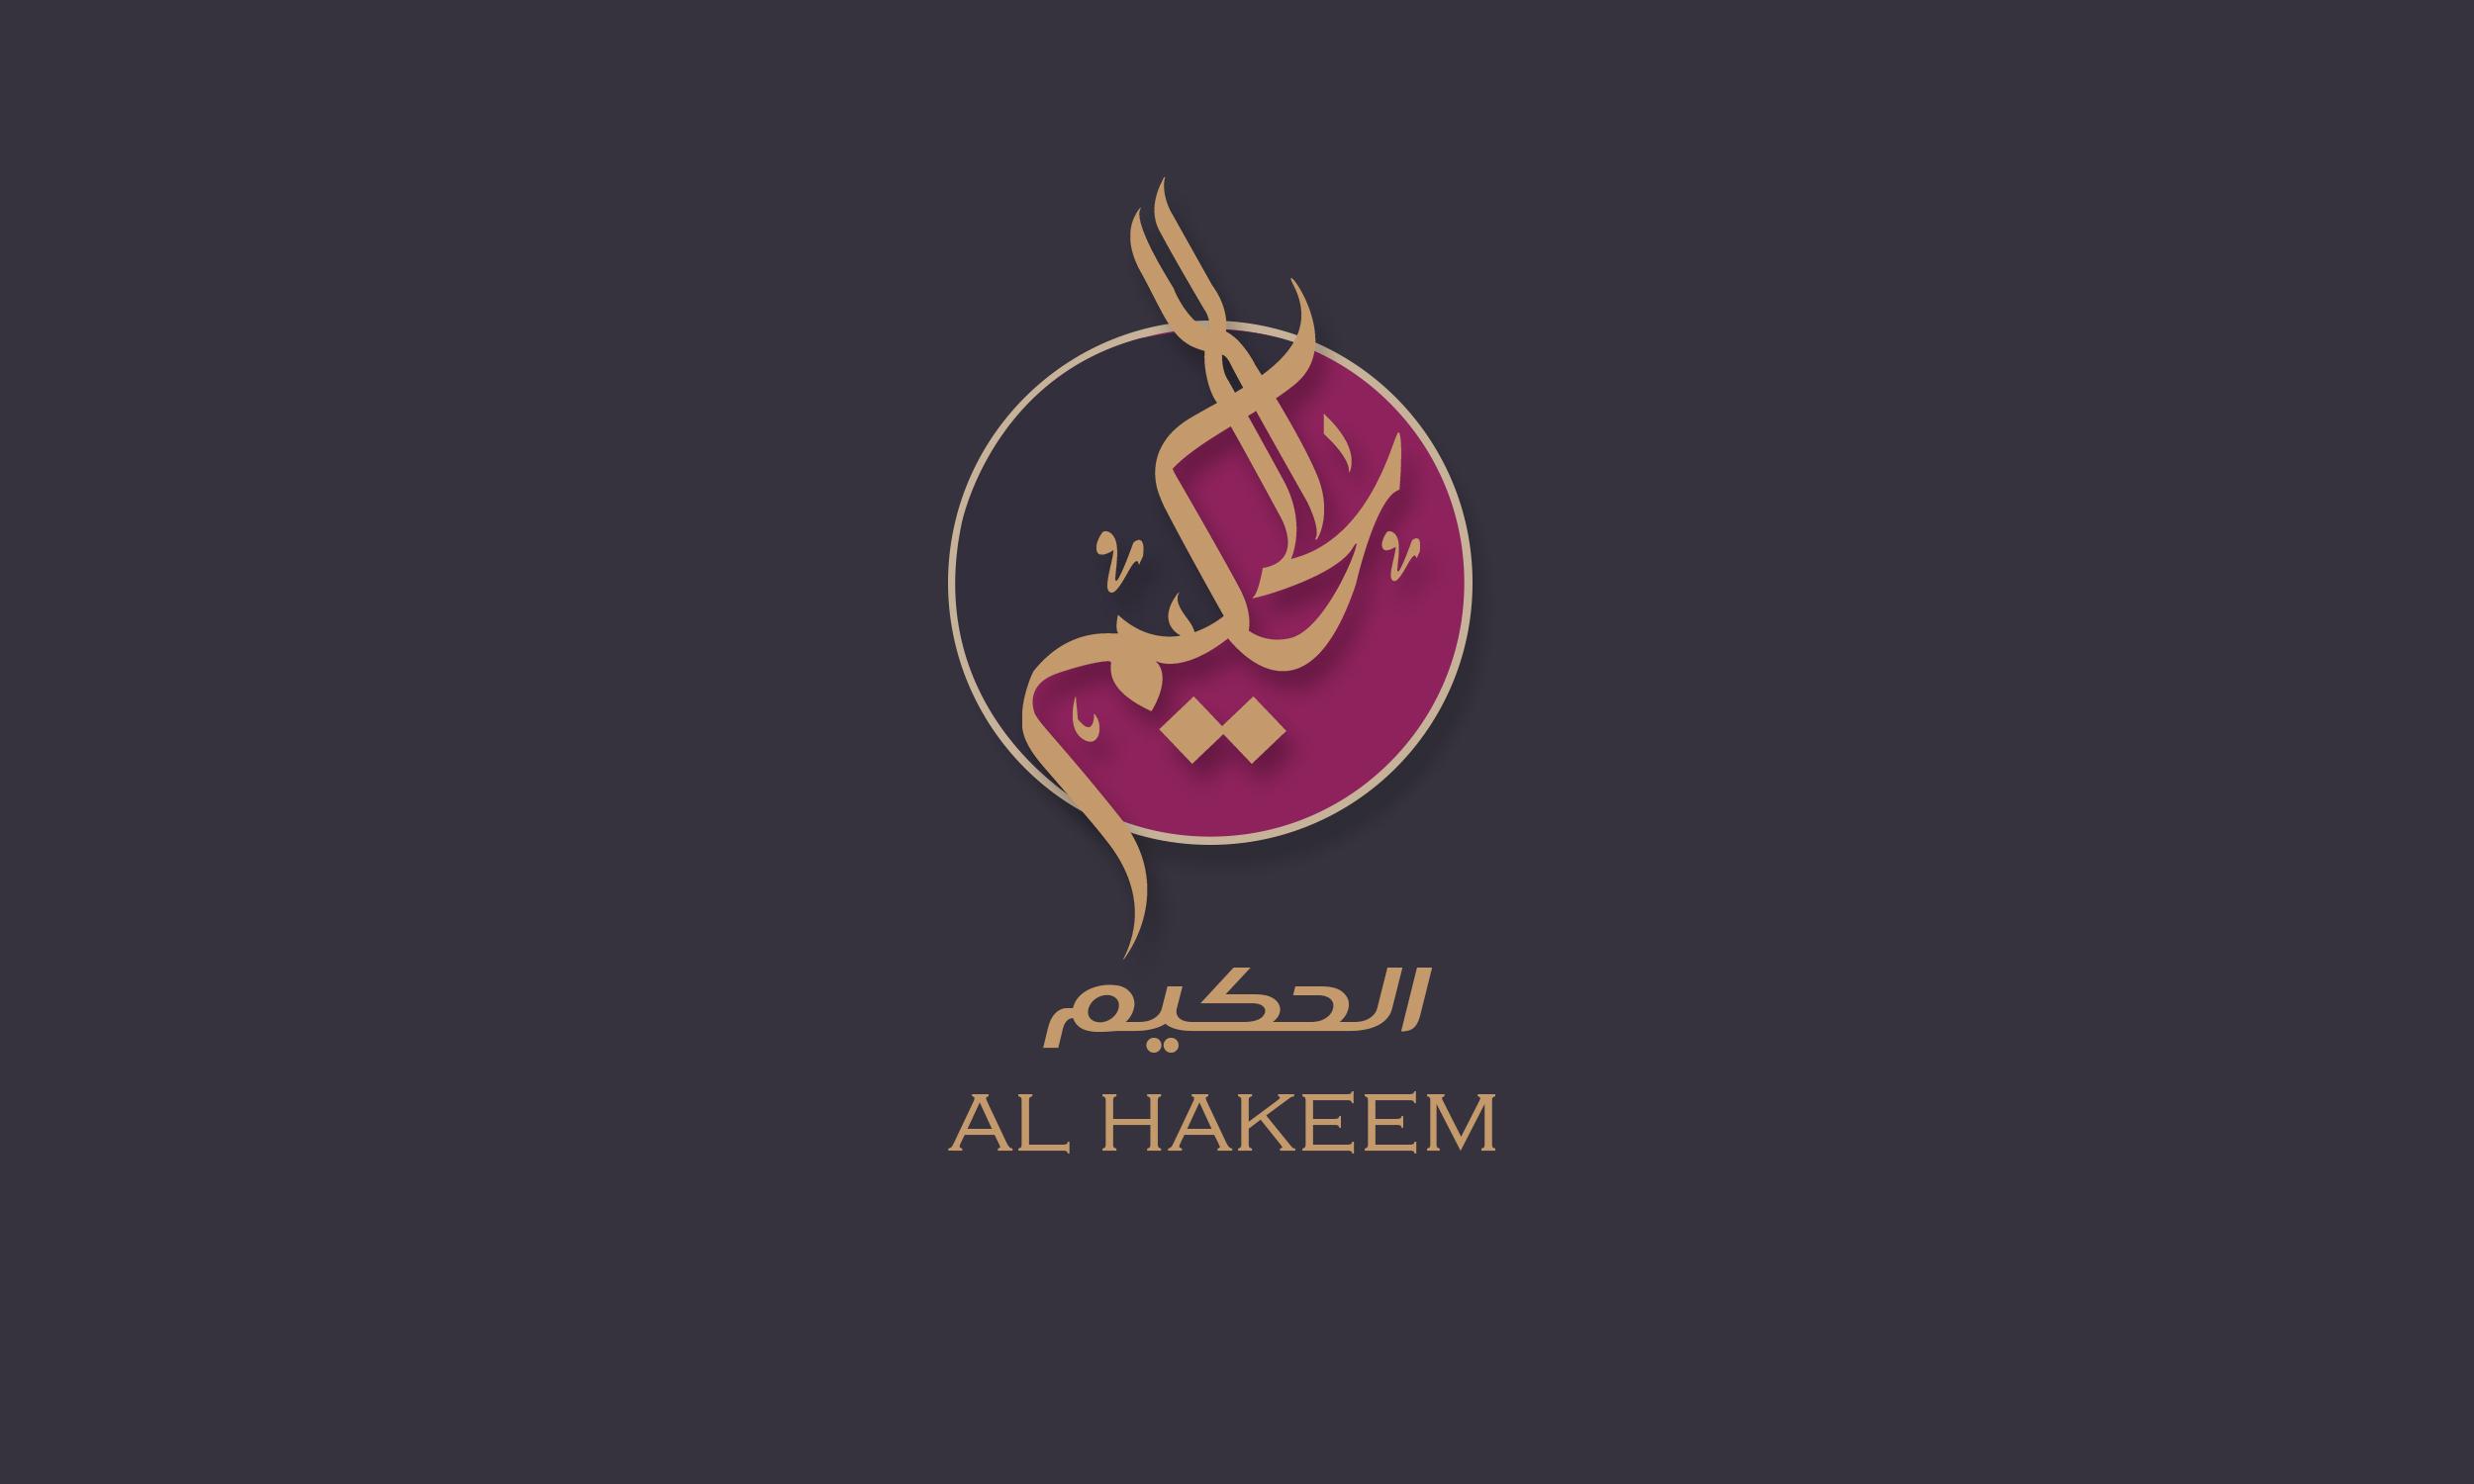 Al Hakeem islamic Arabic logo design example 30